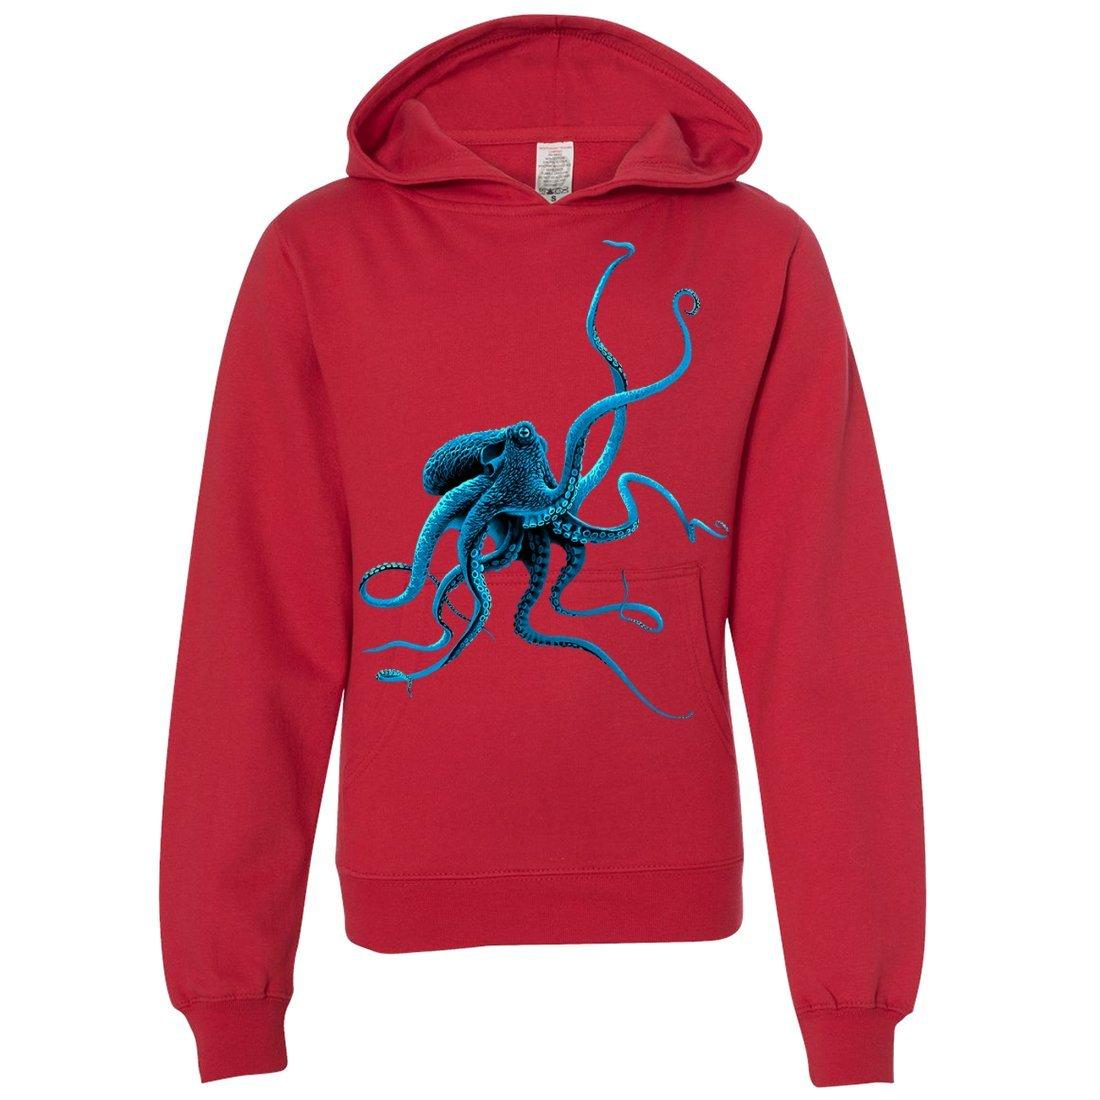 Dolphin Shirt Co Octopus Youth Sweatshirt Hoodie